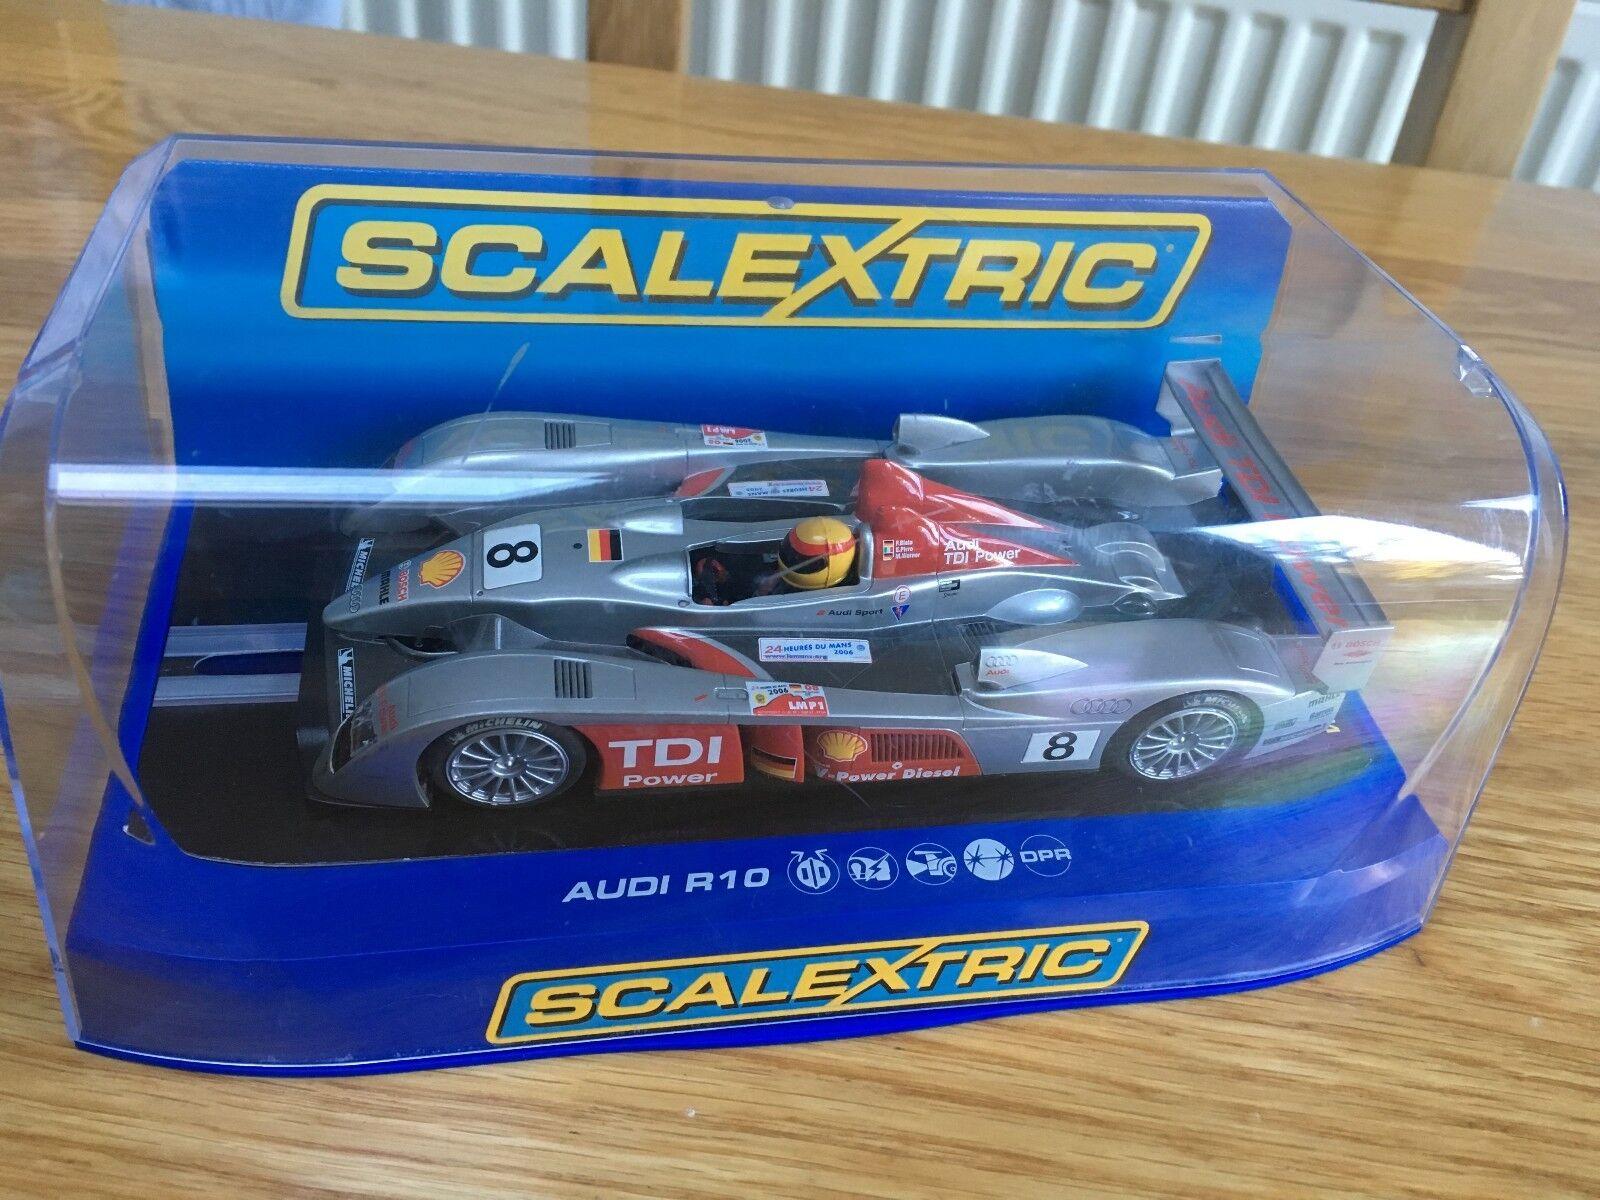 Scalextric Audi R10 TDI Power NO.8 DPR C2809 - Excellent